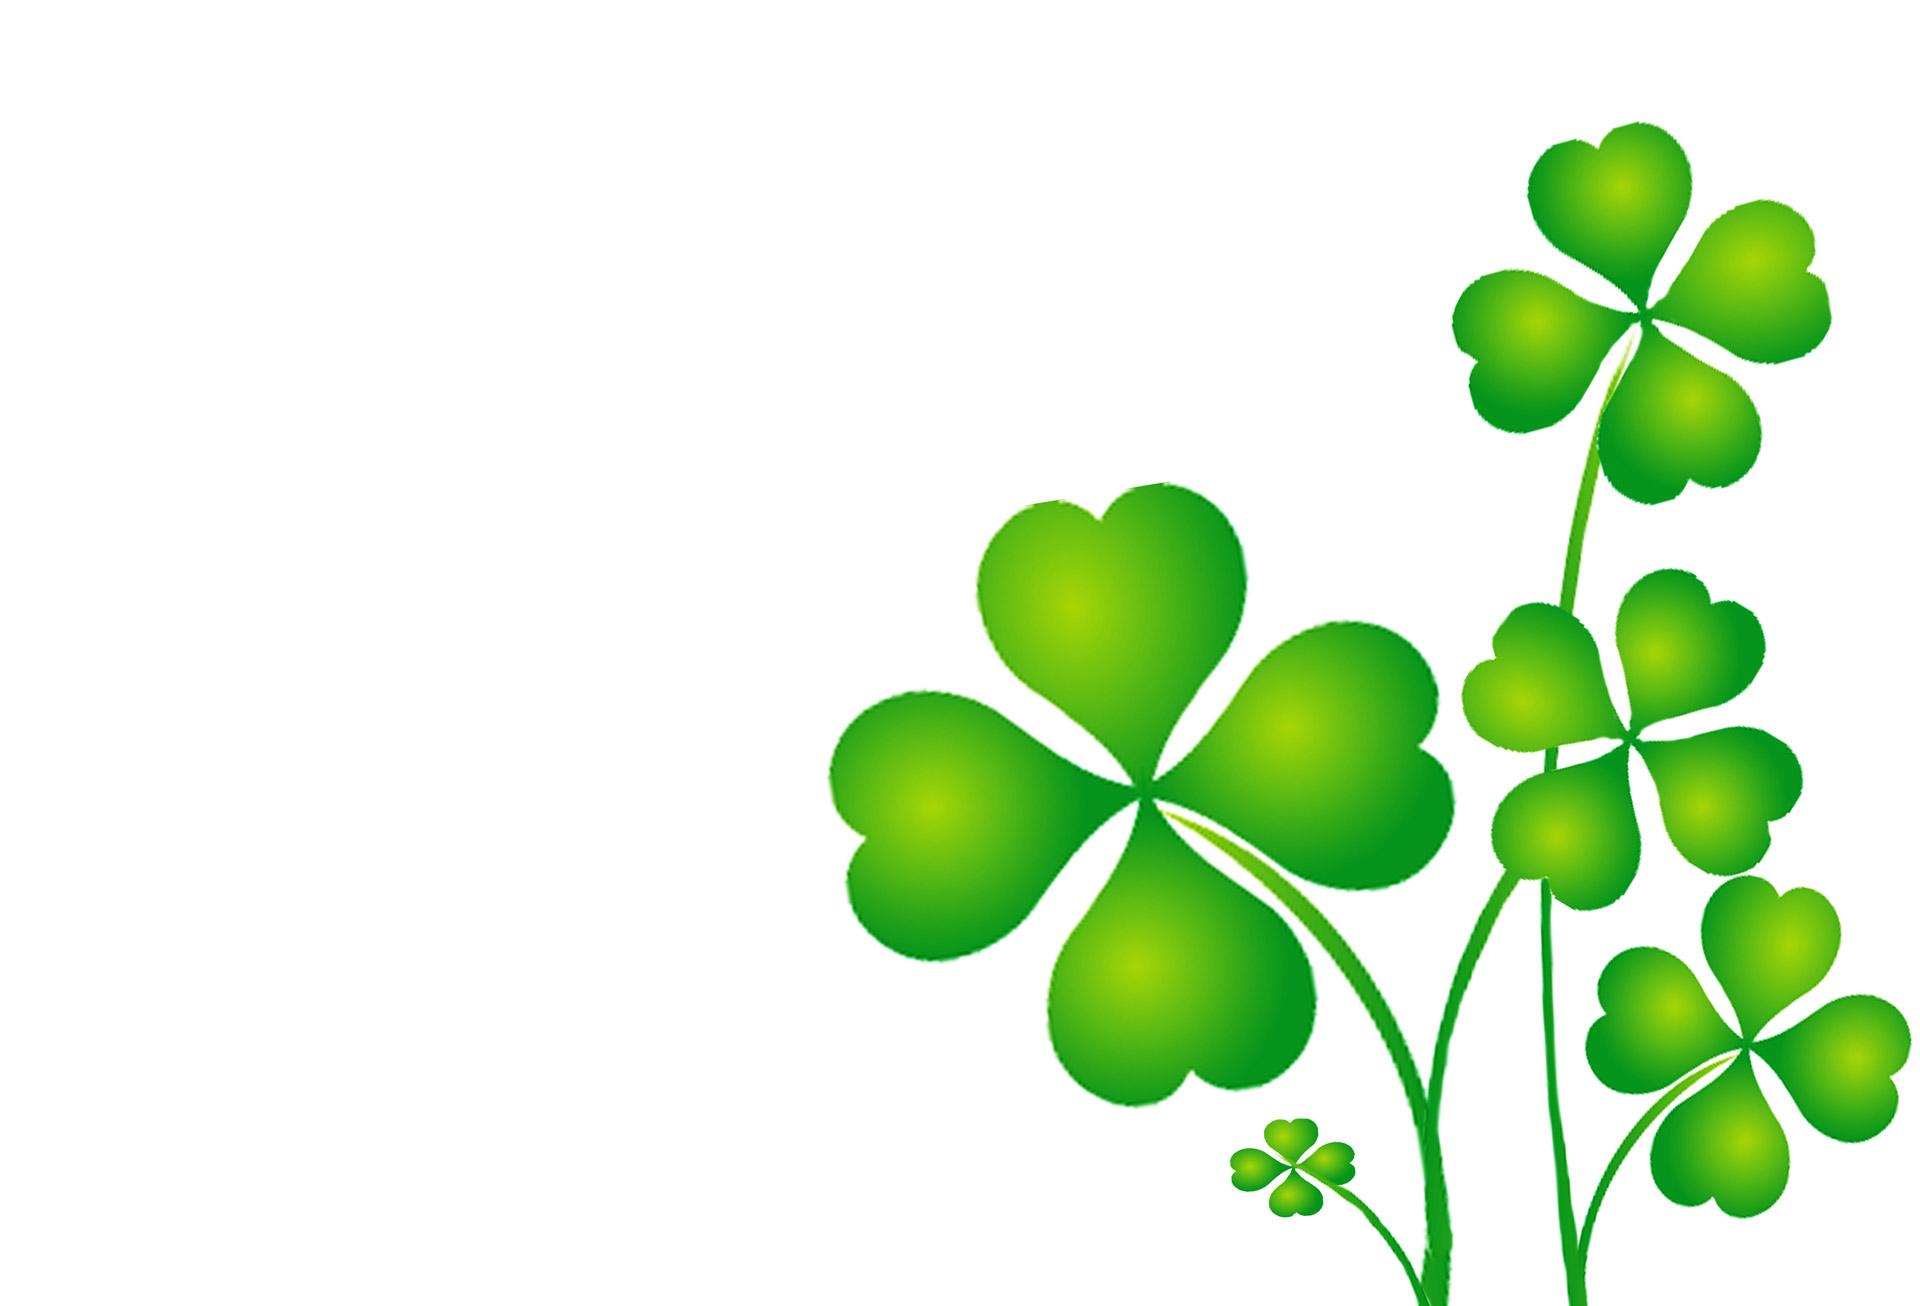 1920x1306 St. Patricks Day Free Stock Photo